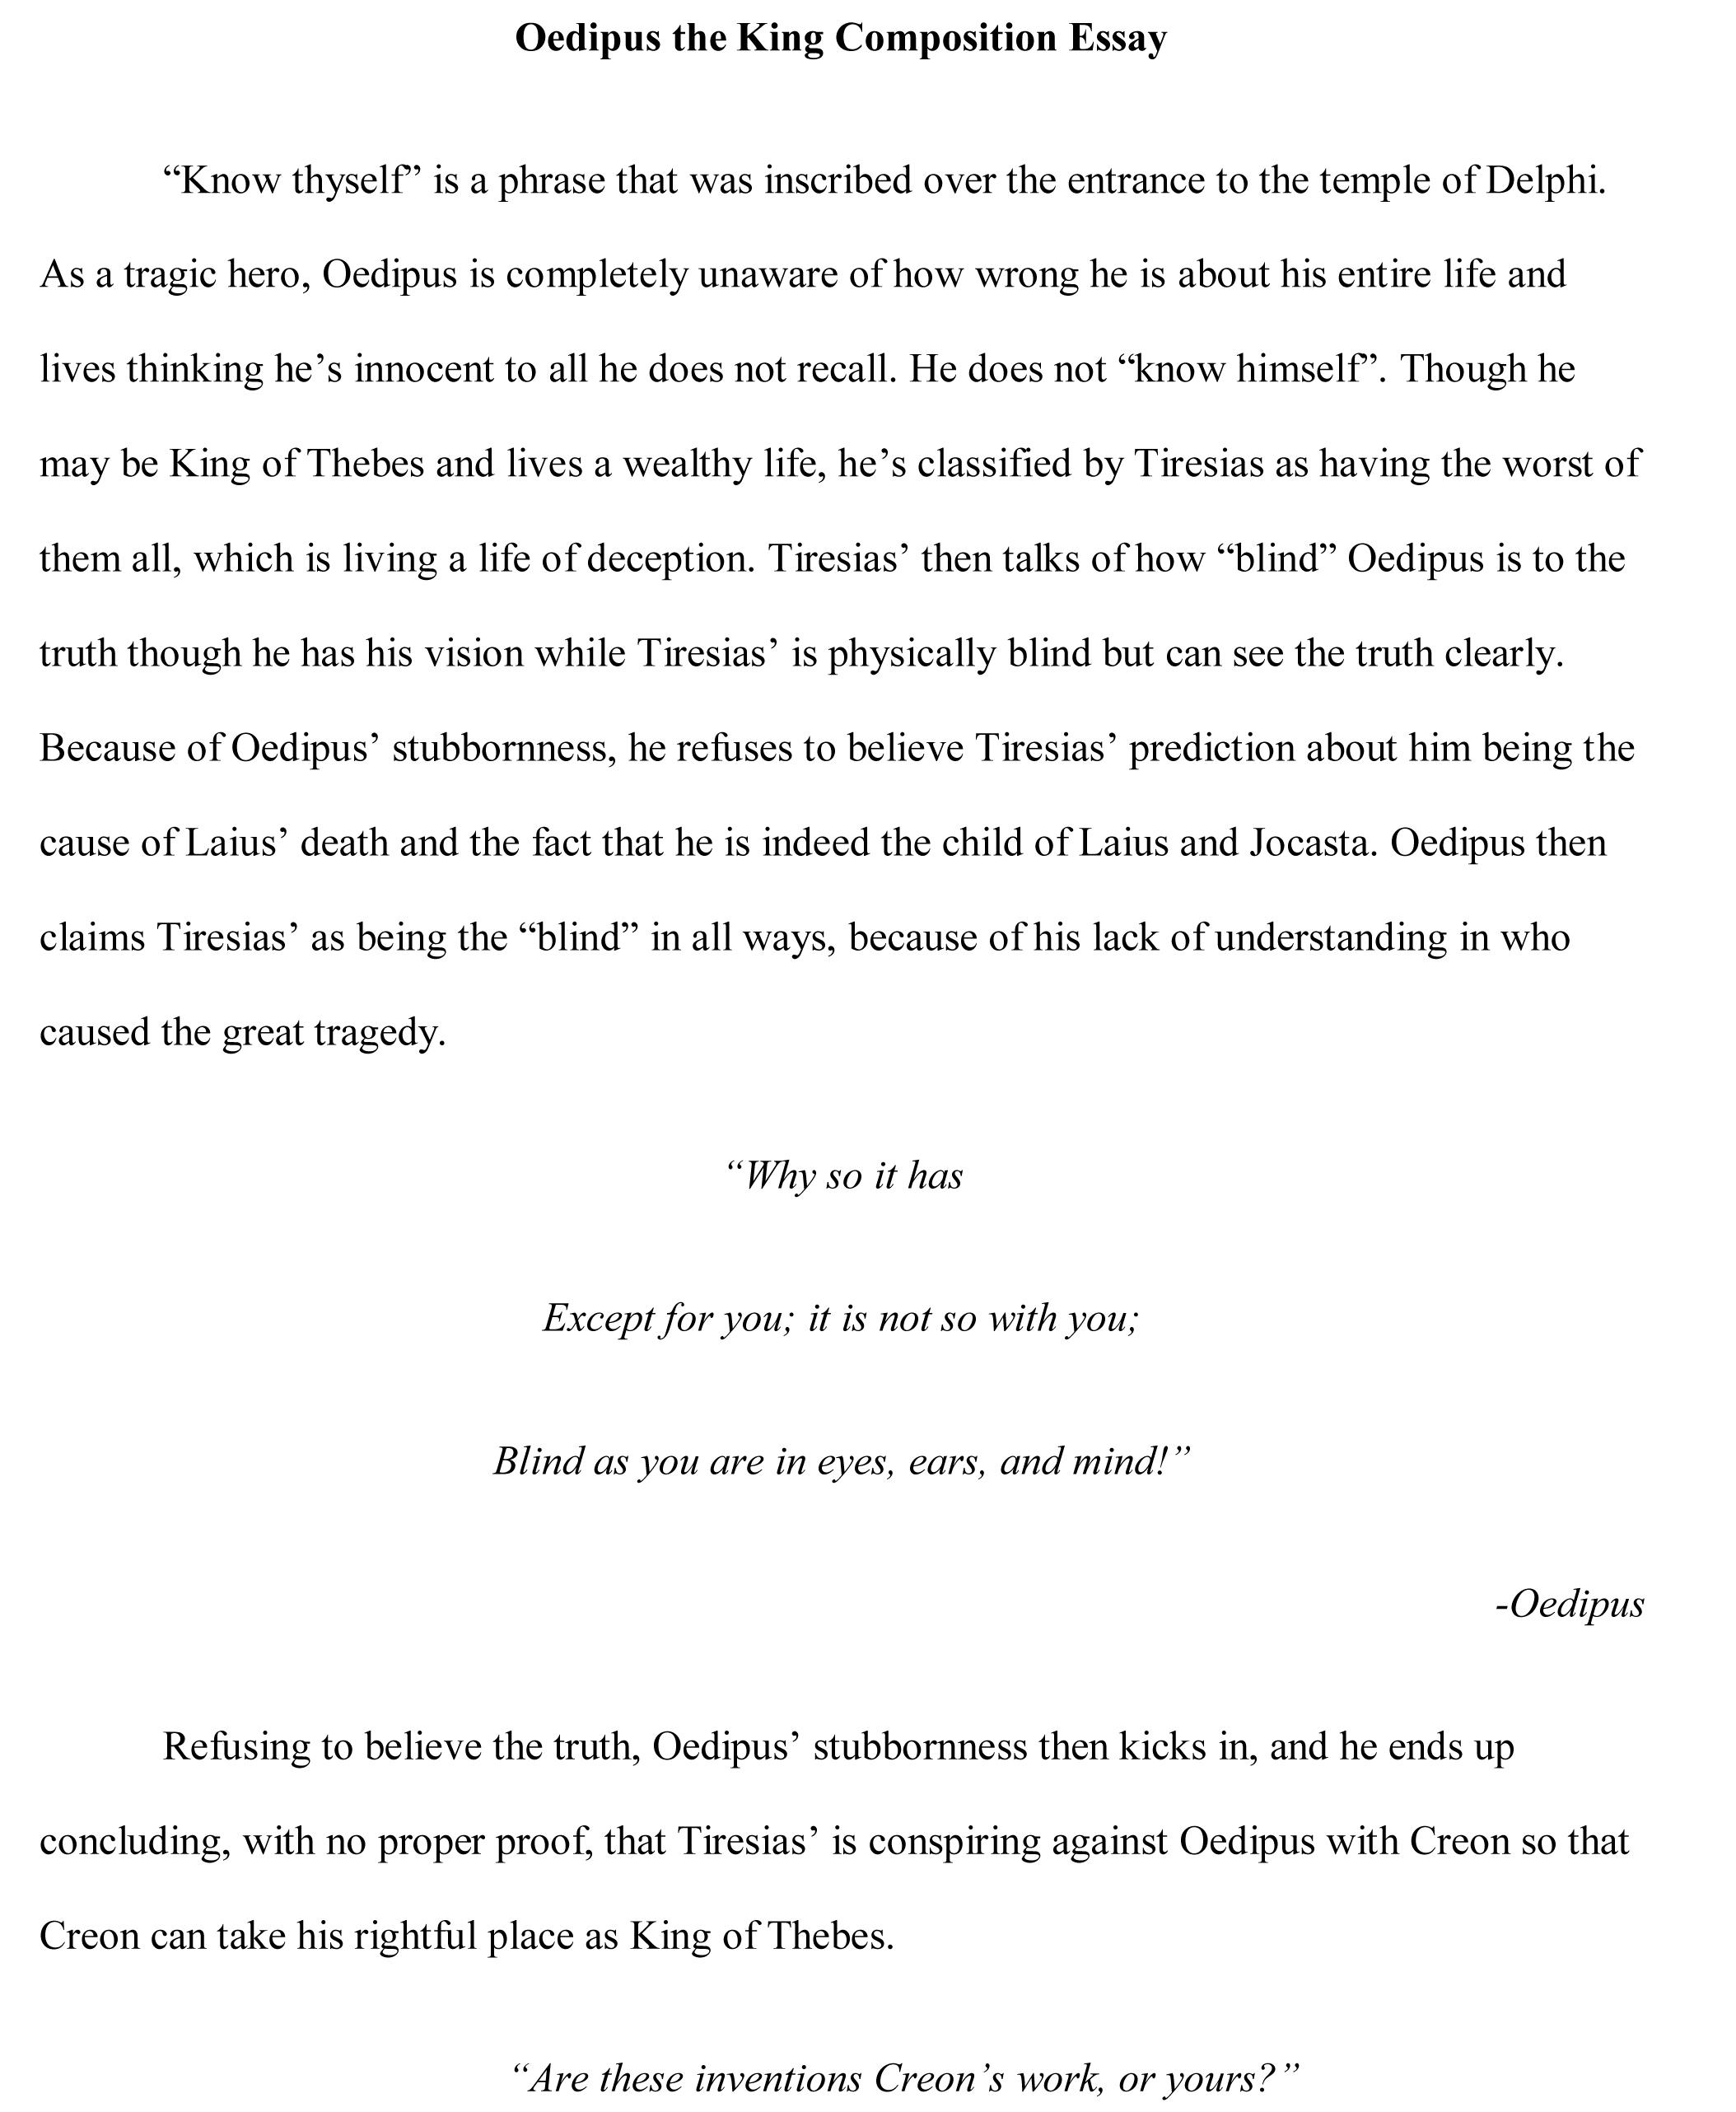 007 Essay Example Reworder Oedipus Free Magnificent Best Rewriter Software Download App Full